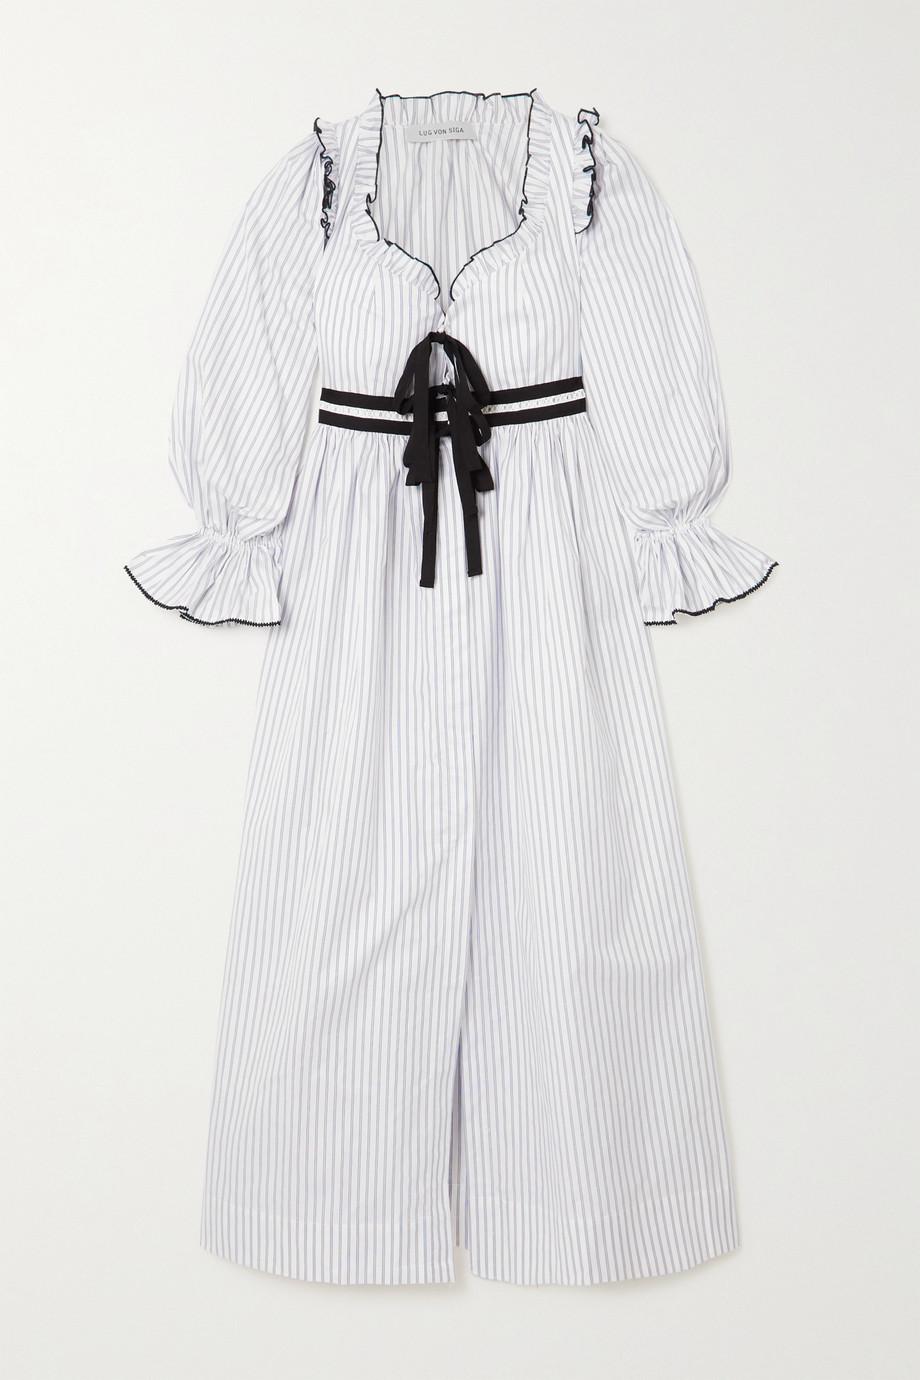 Lug Von Siga Eleanor bow-detailed ruffled striped cotton dress